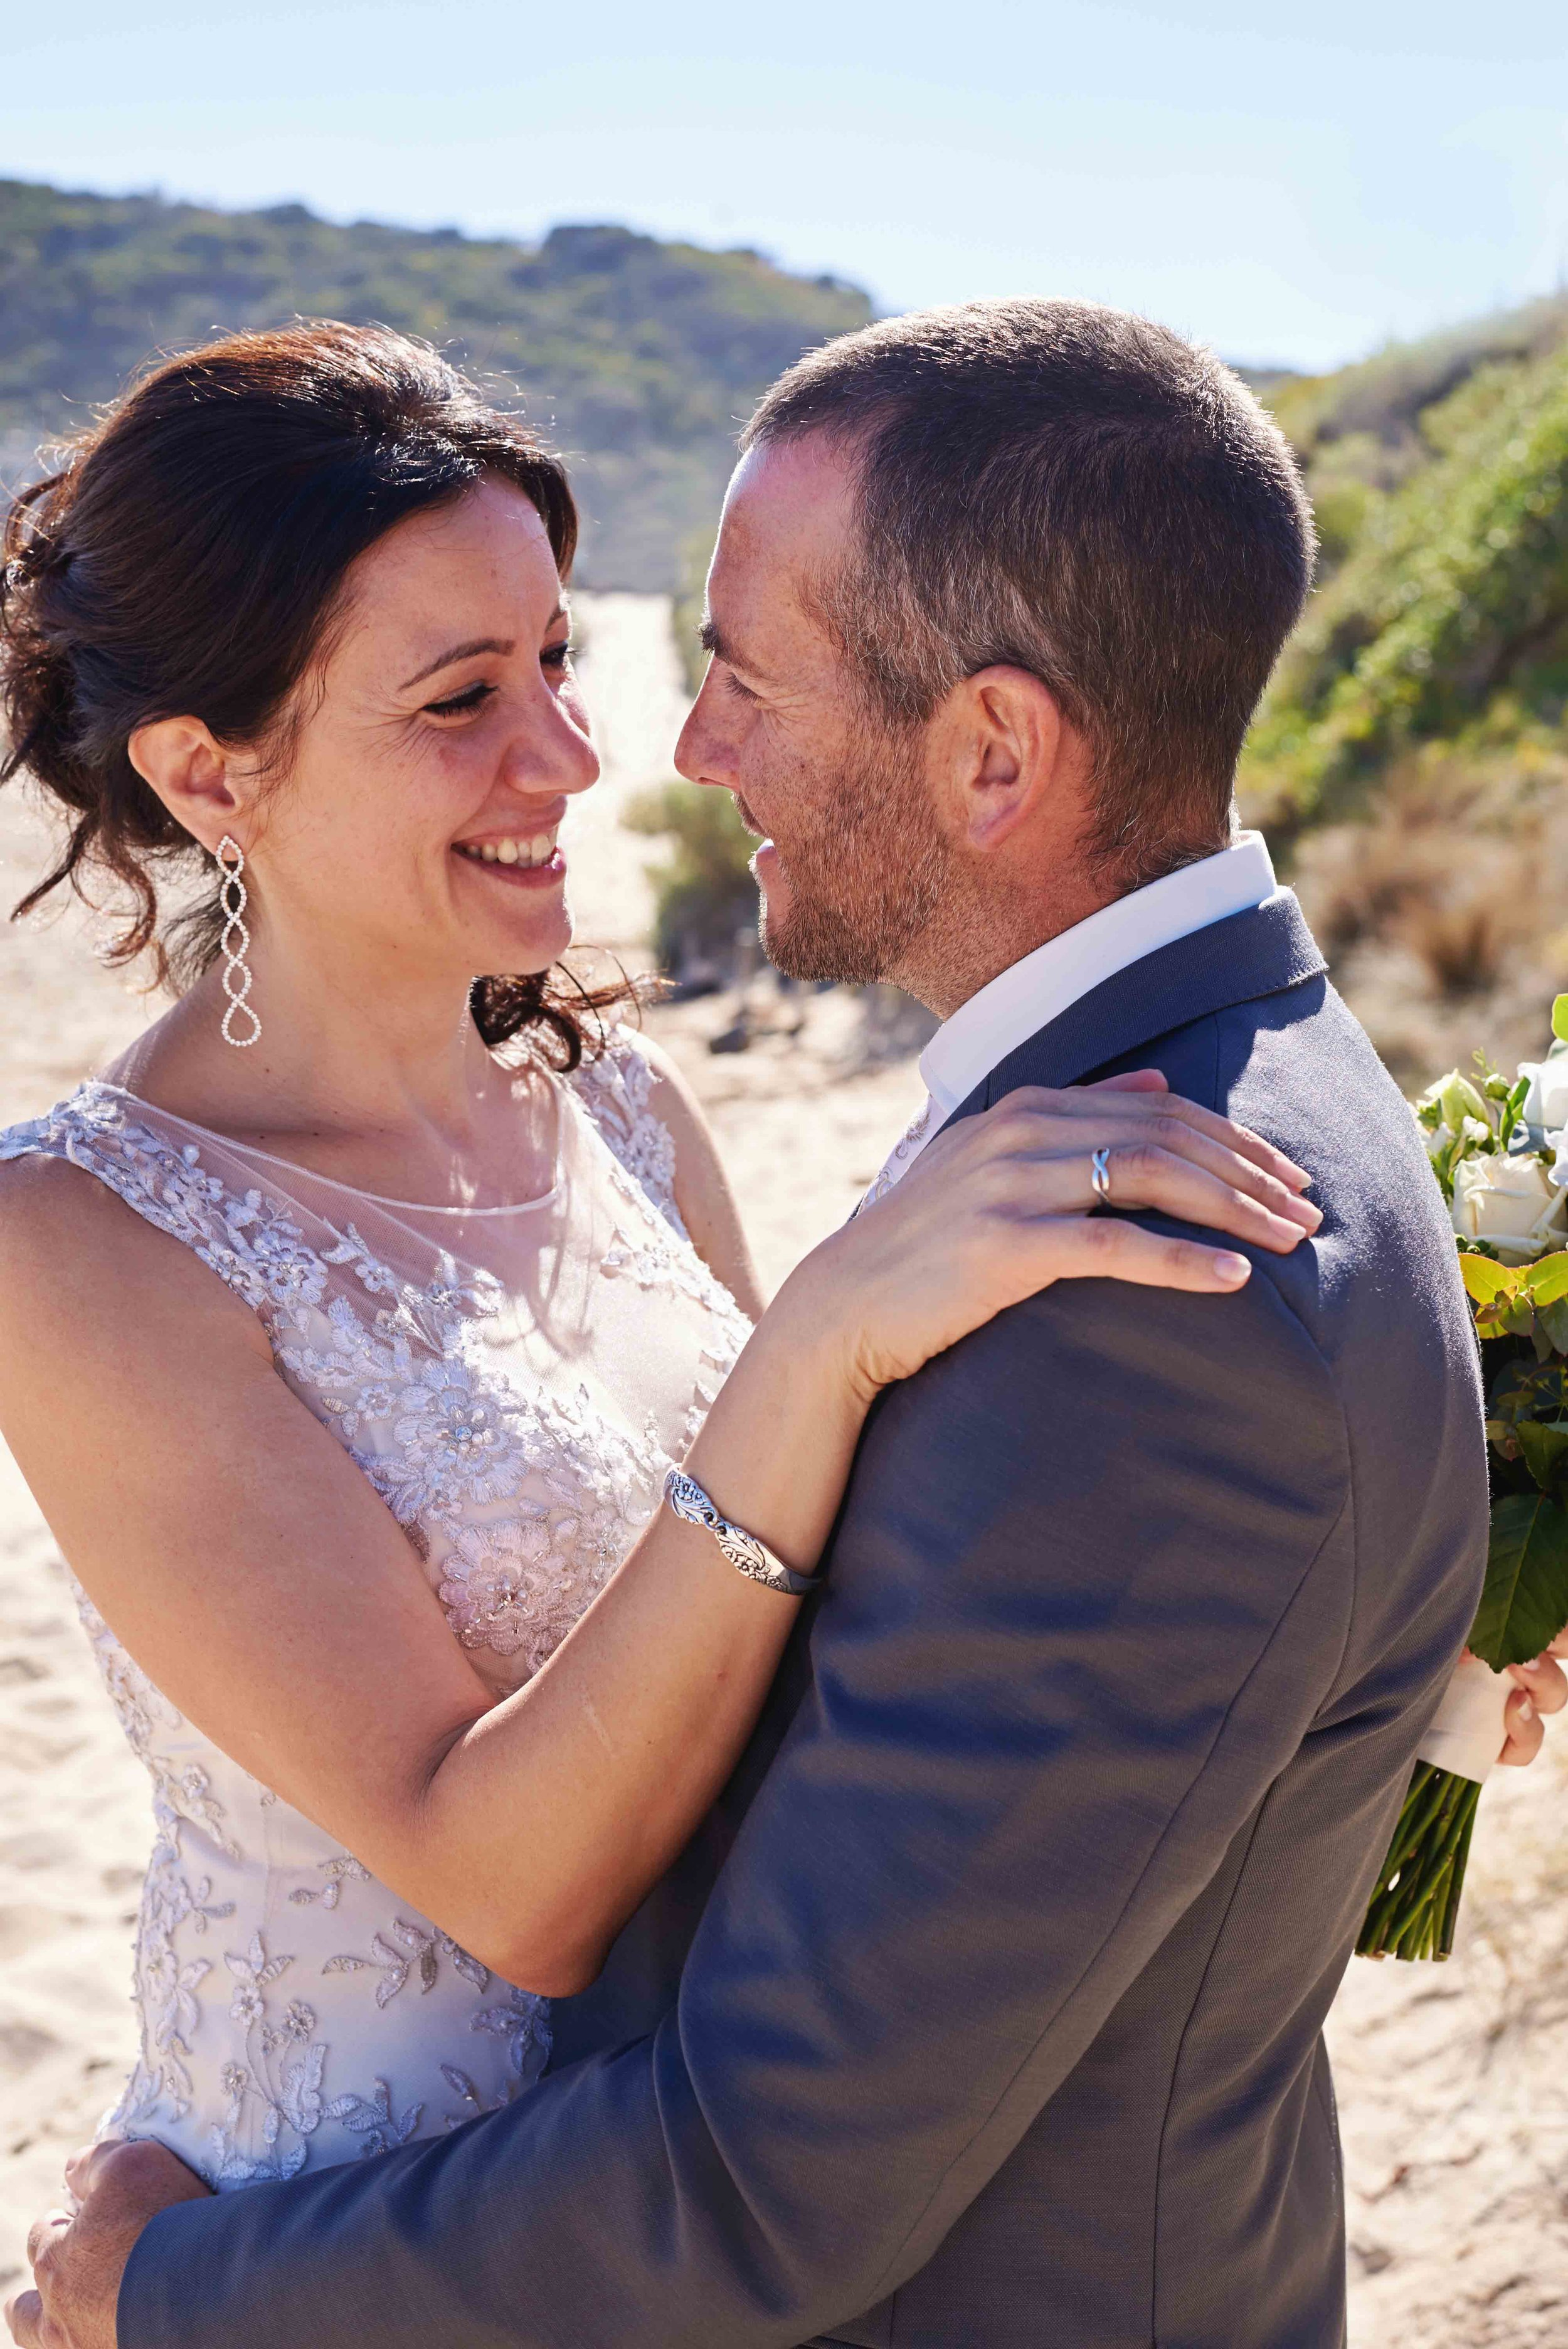 sorrento-wedding-photography-all-smiles-marissa-jade-photography-116.jpg